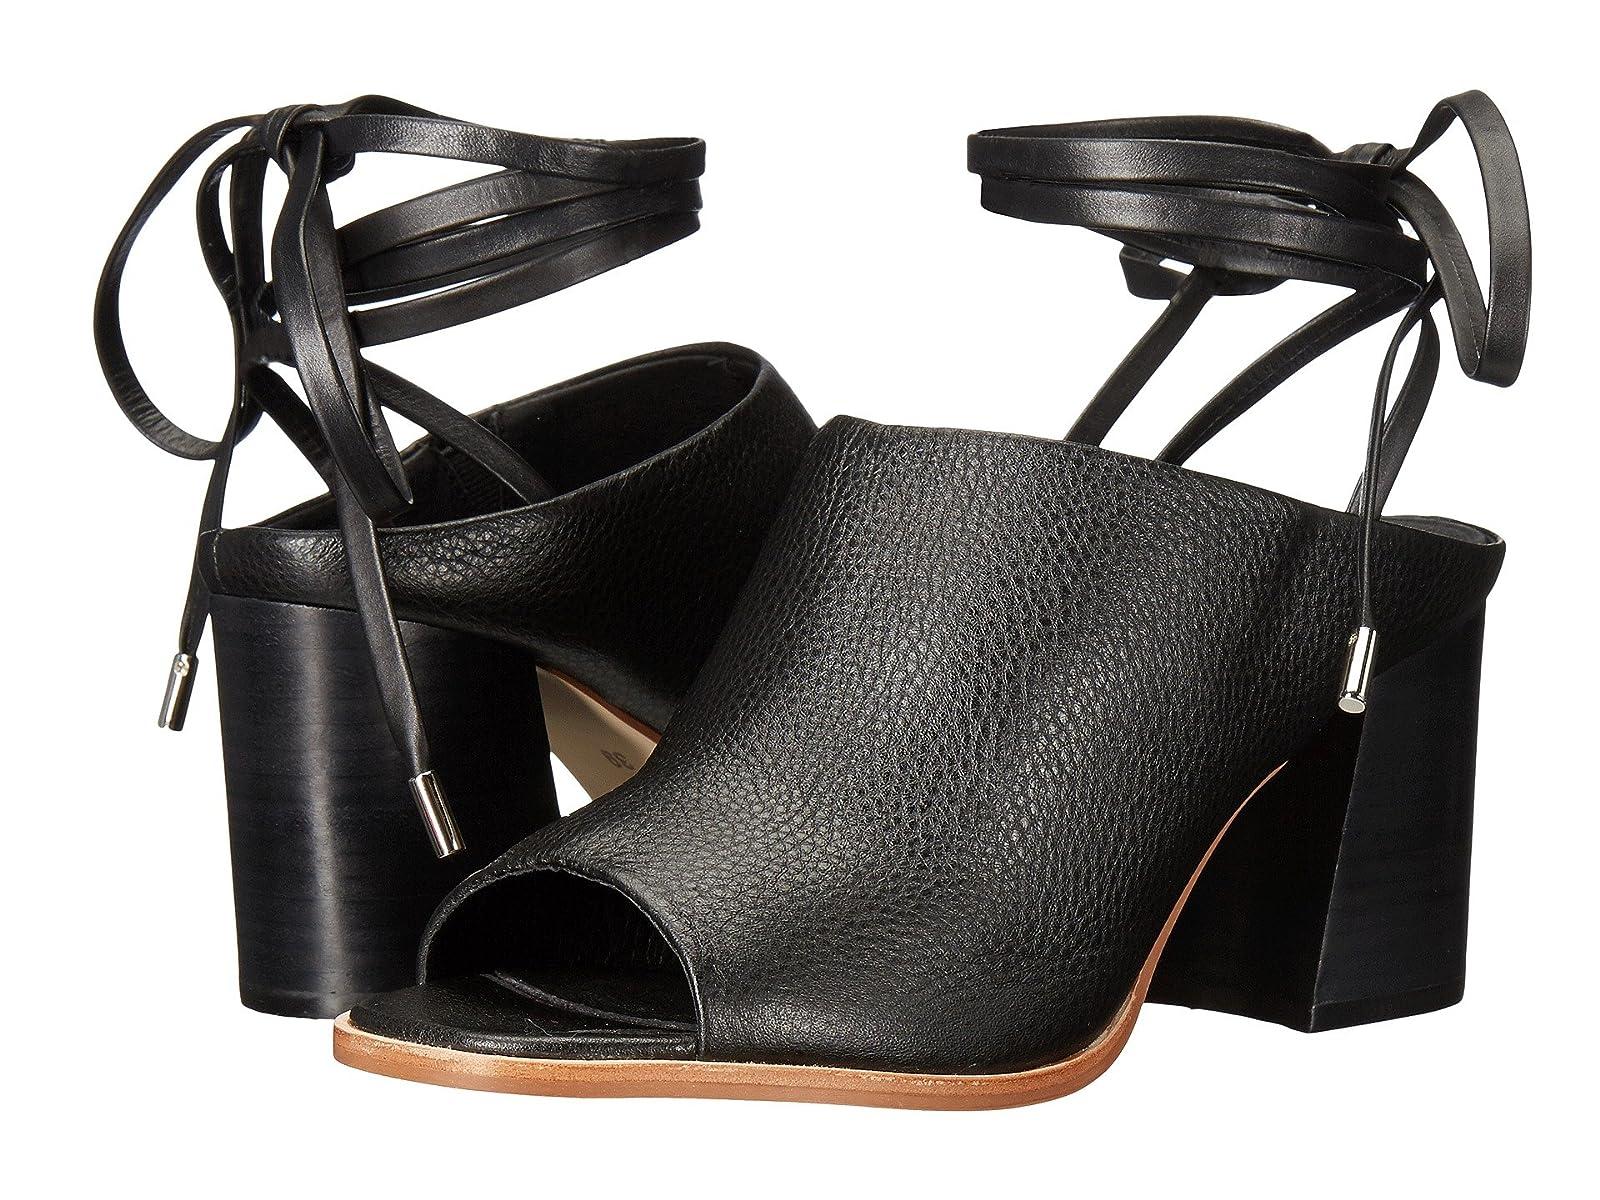 Sol Sana Rango MuleCheap and distinctive eye-catching shoes